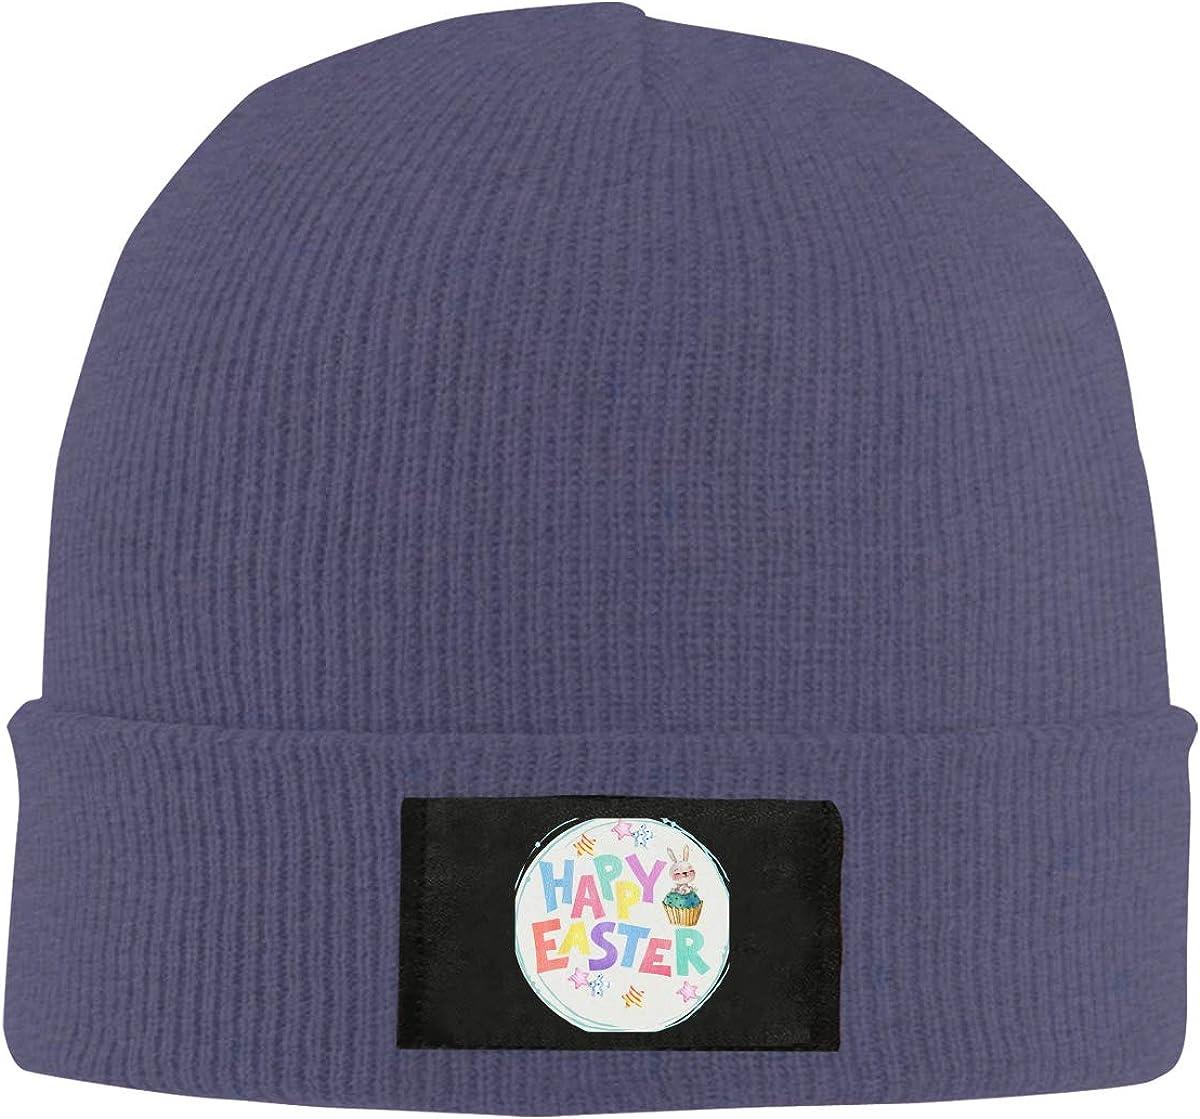 RZMdSG Happy Easter Bunny Unisex Winter Printed Warm Knitting Hats Skull Cap